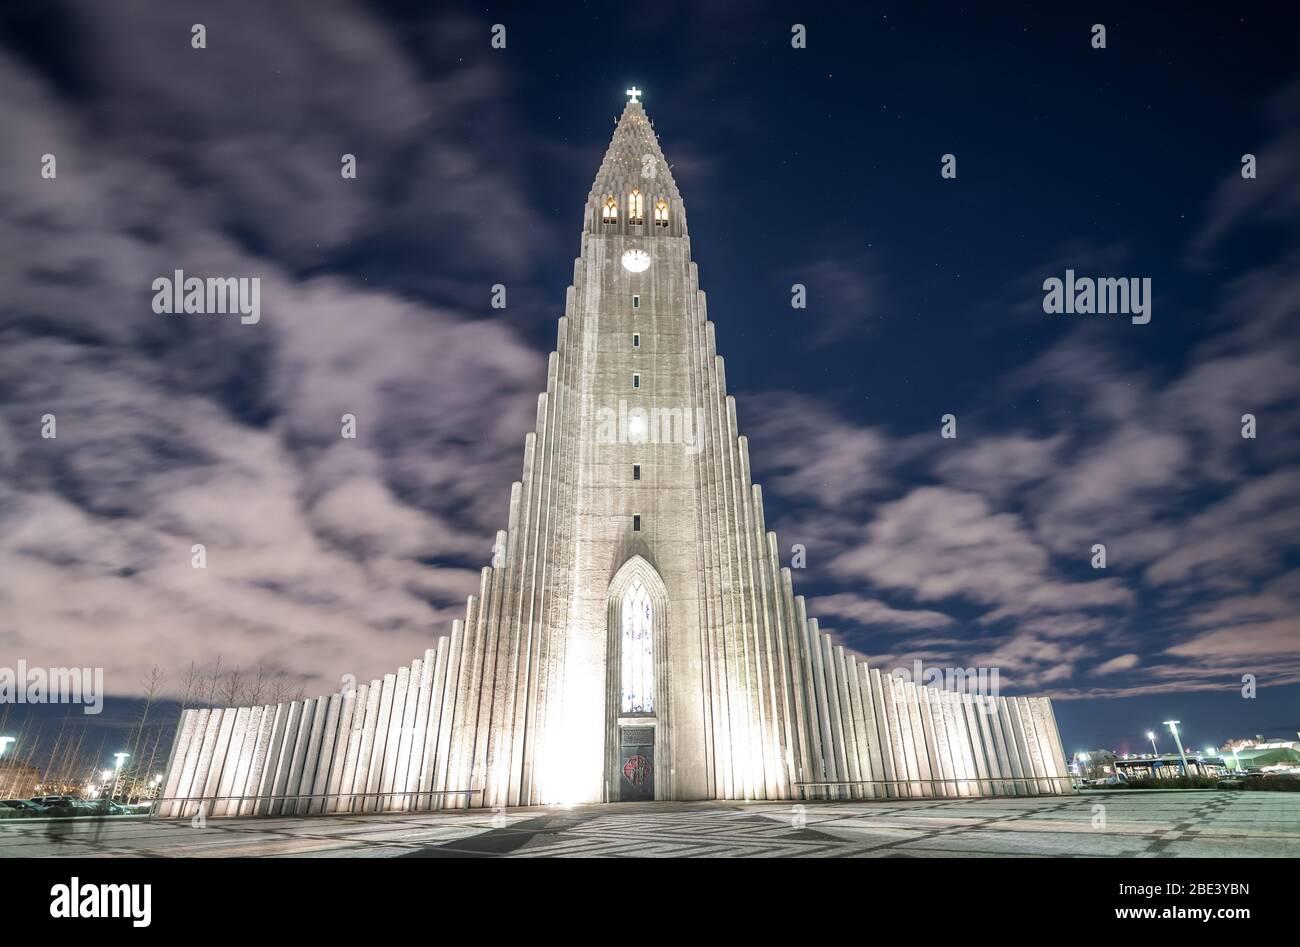 Hallgrímskirkja, iglesia parroquial luterana en Reykjavik, Islandia Foto de stock